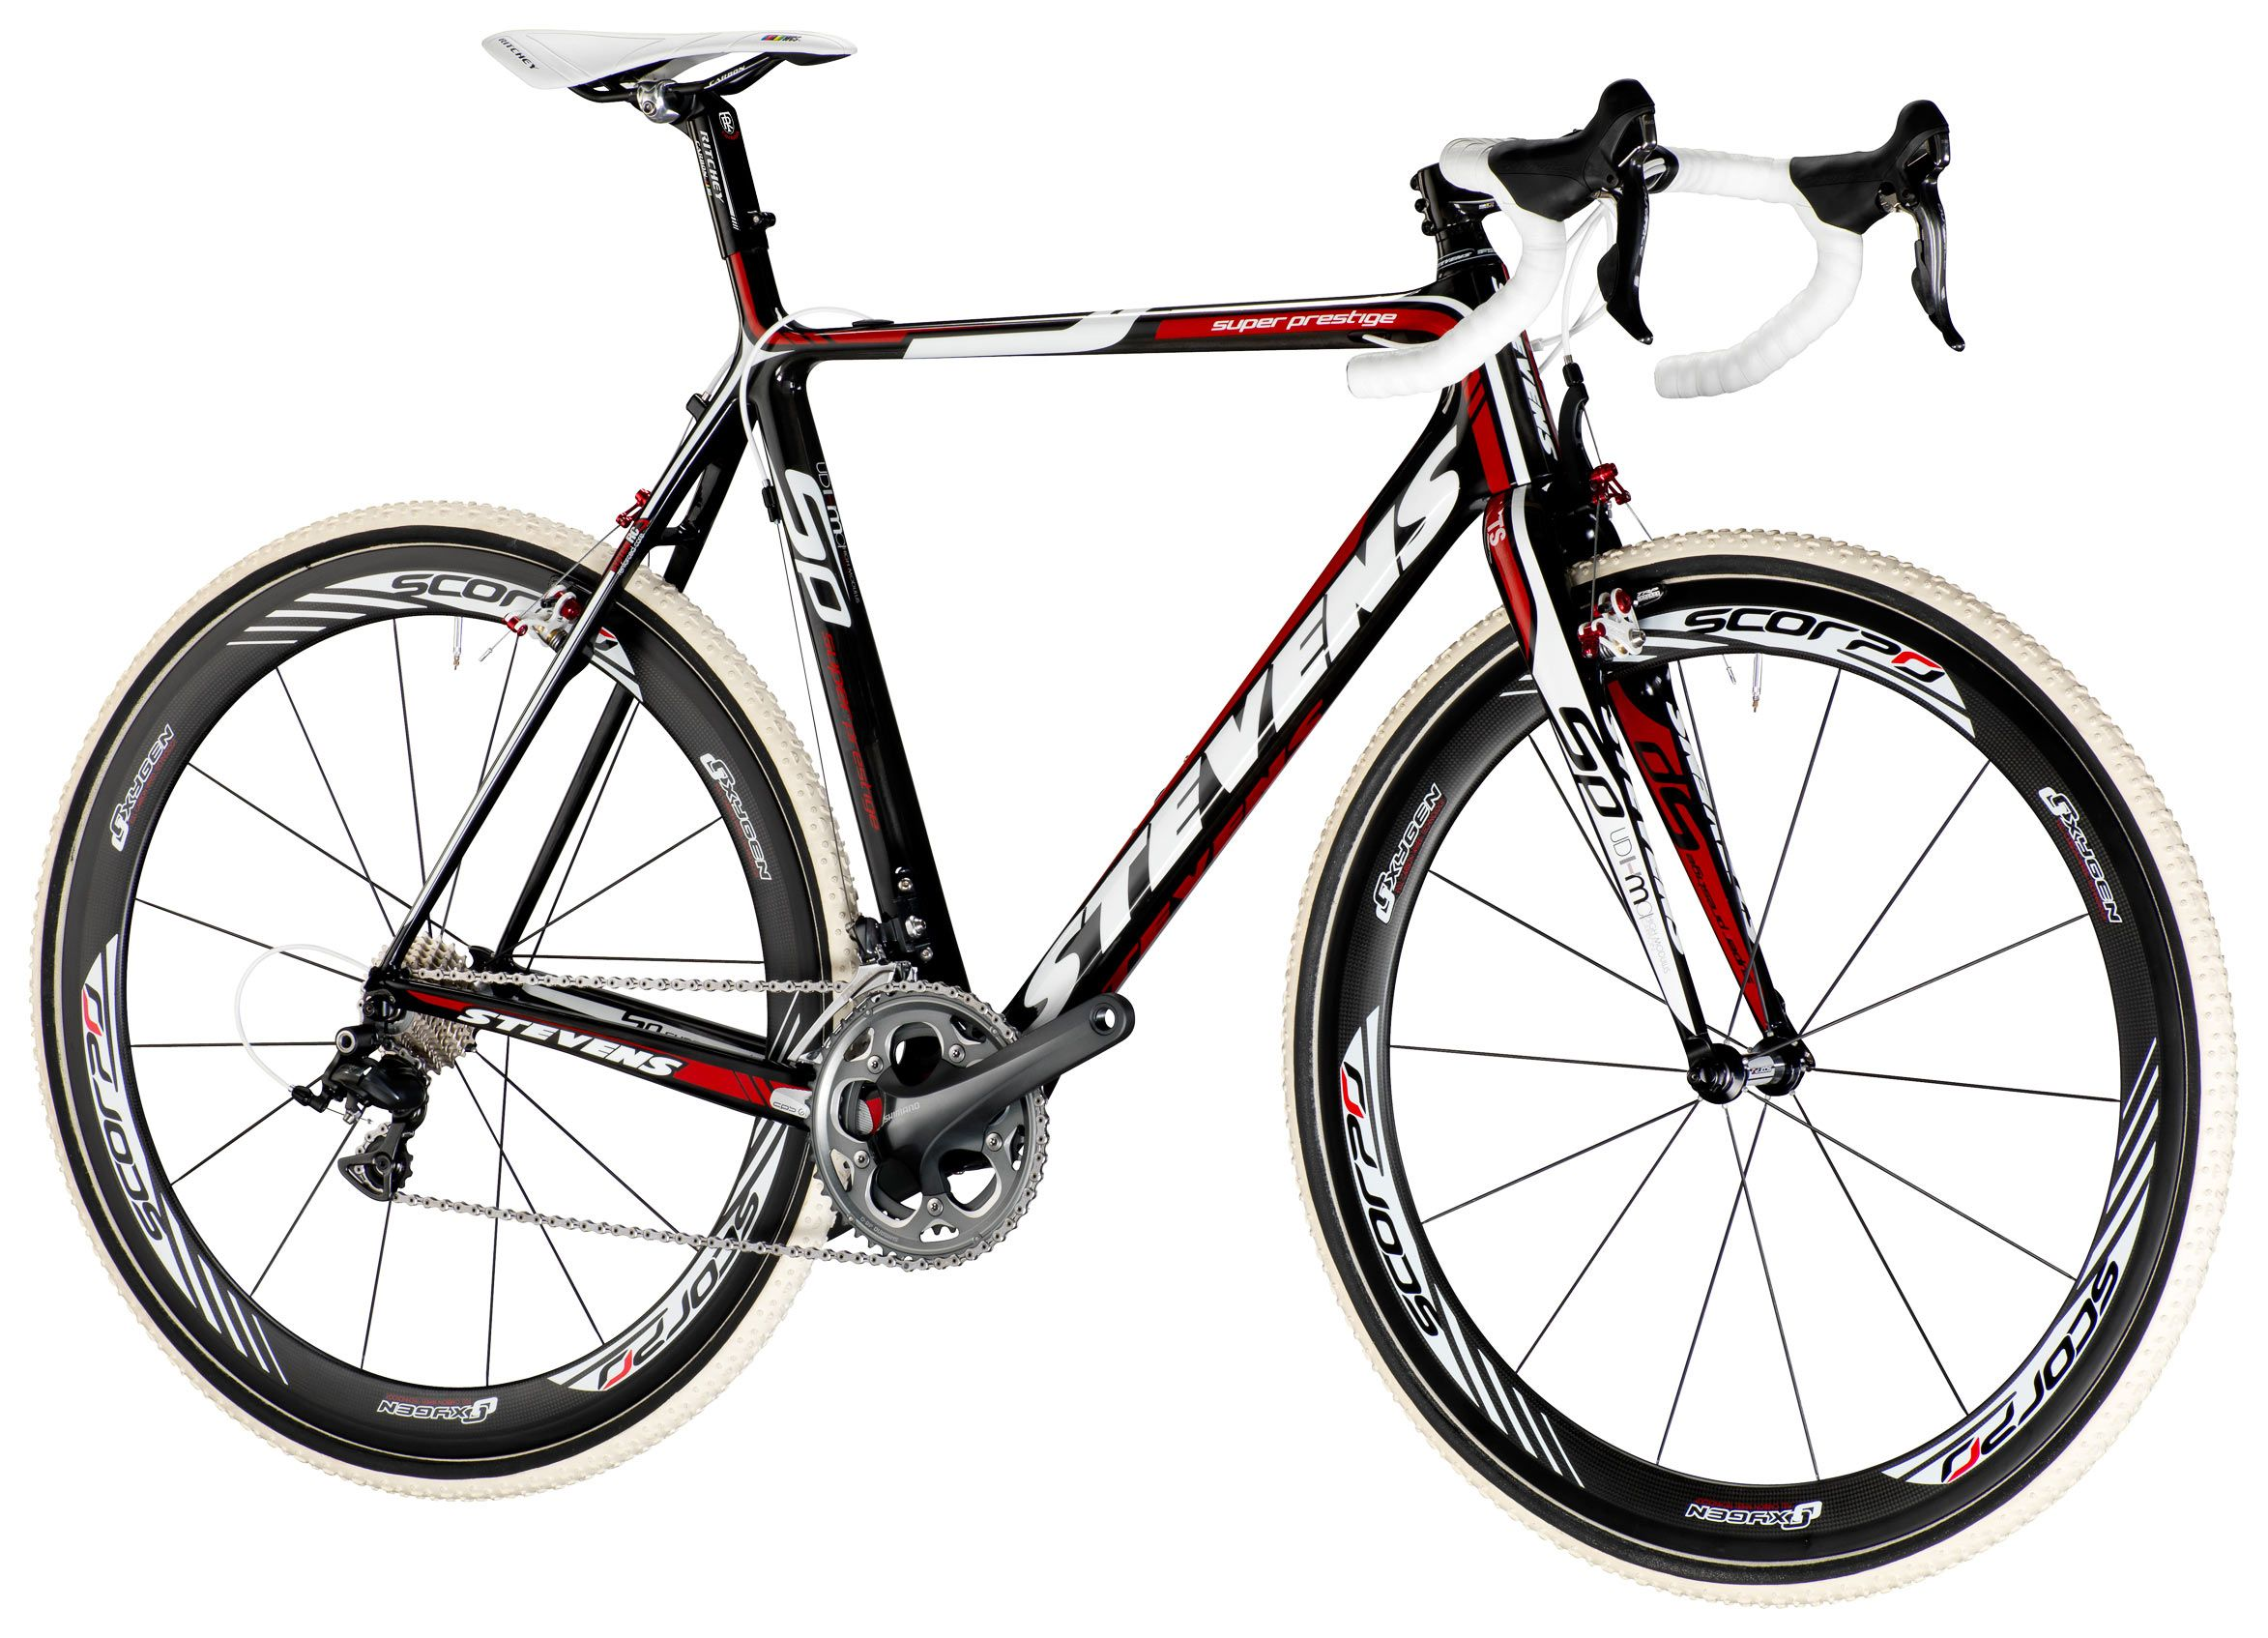 Stevens Super Prestige Beautiful Cyclocross Bikes Pinterest